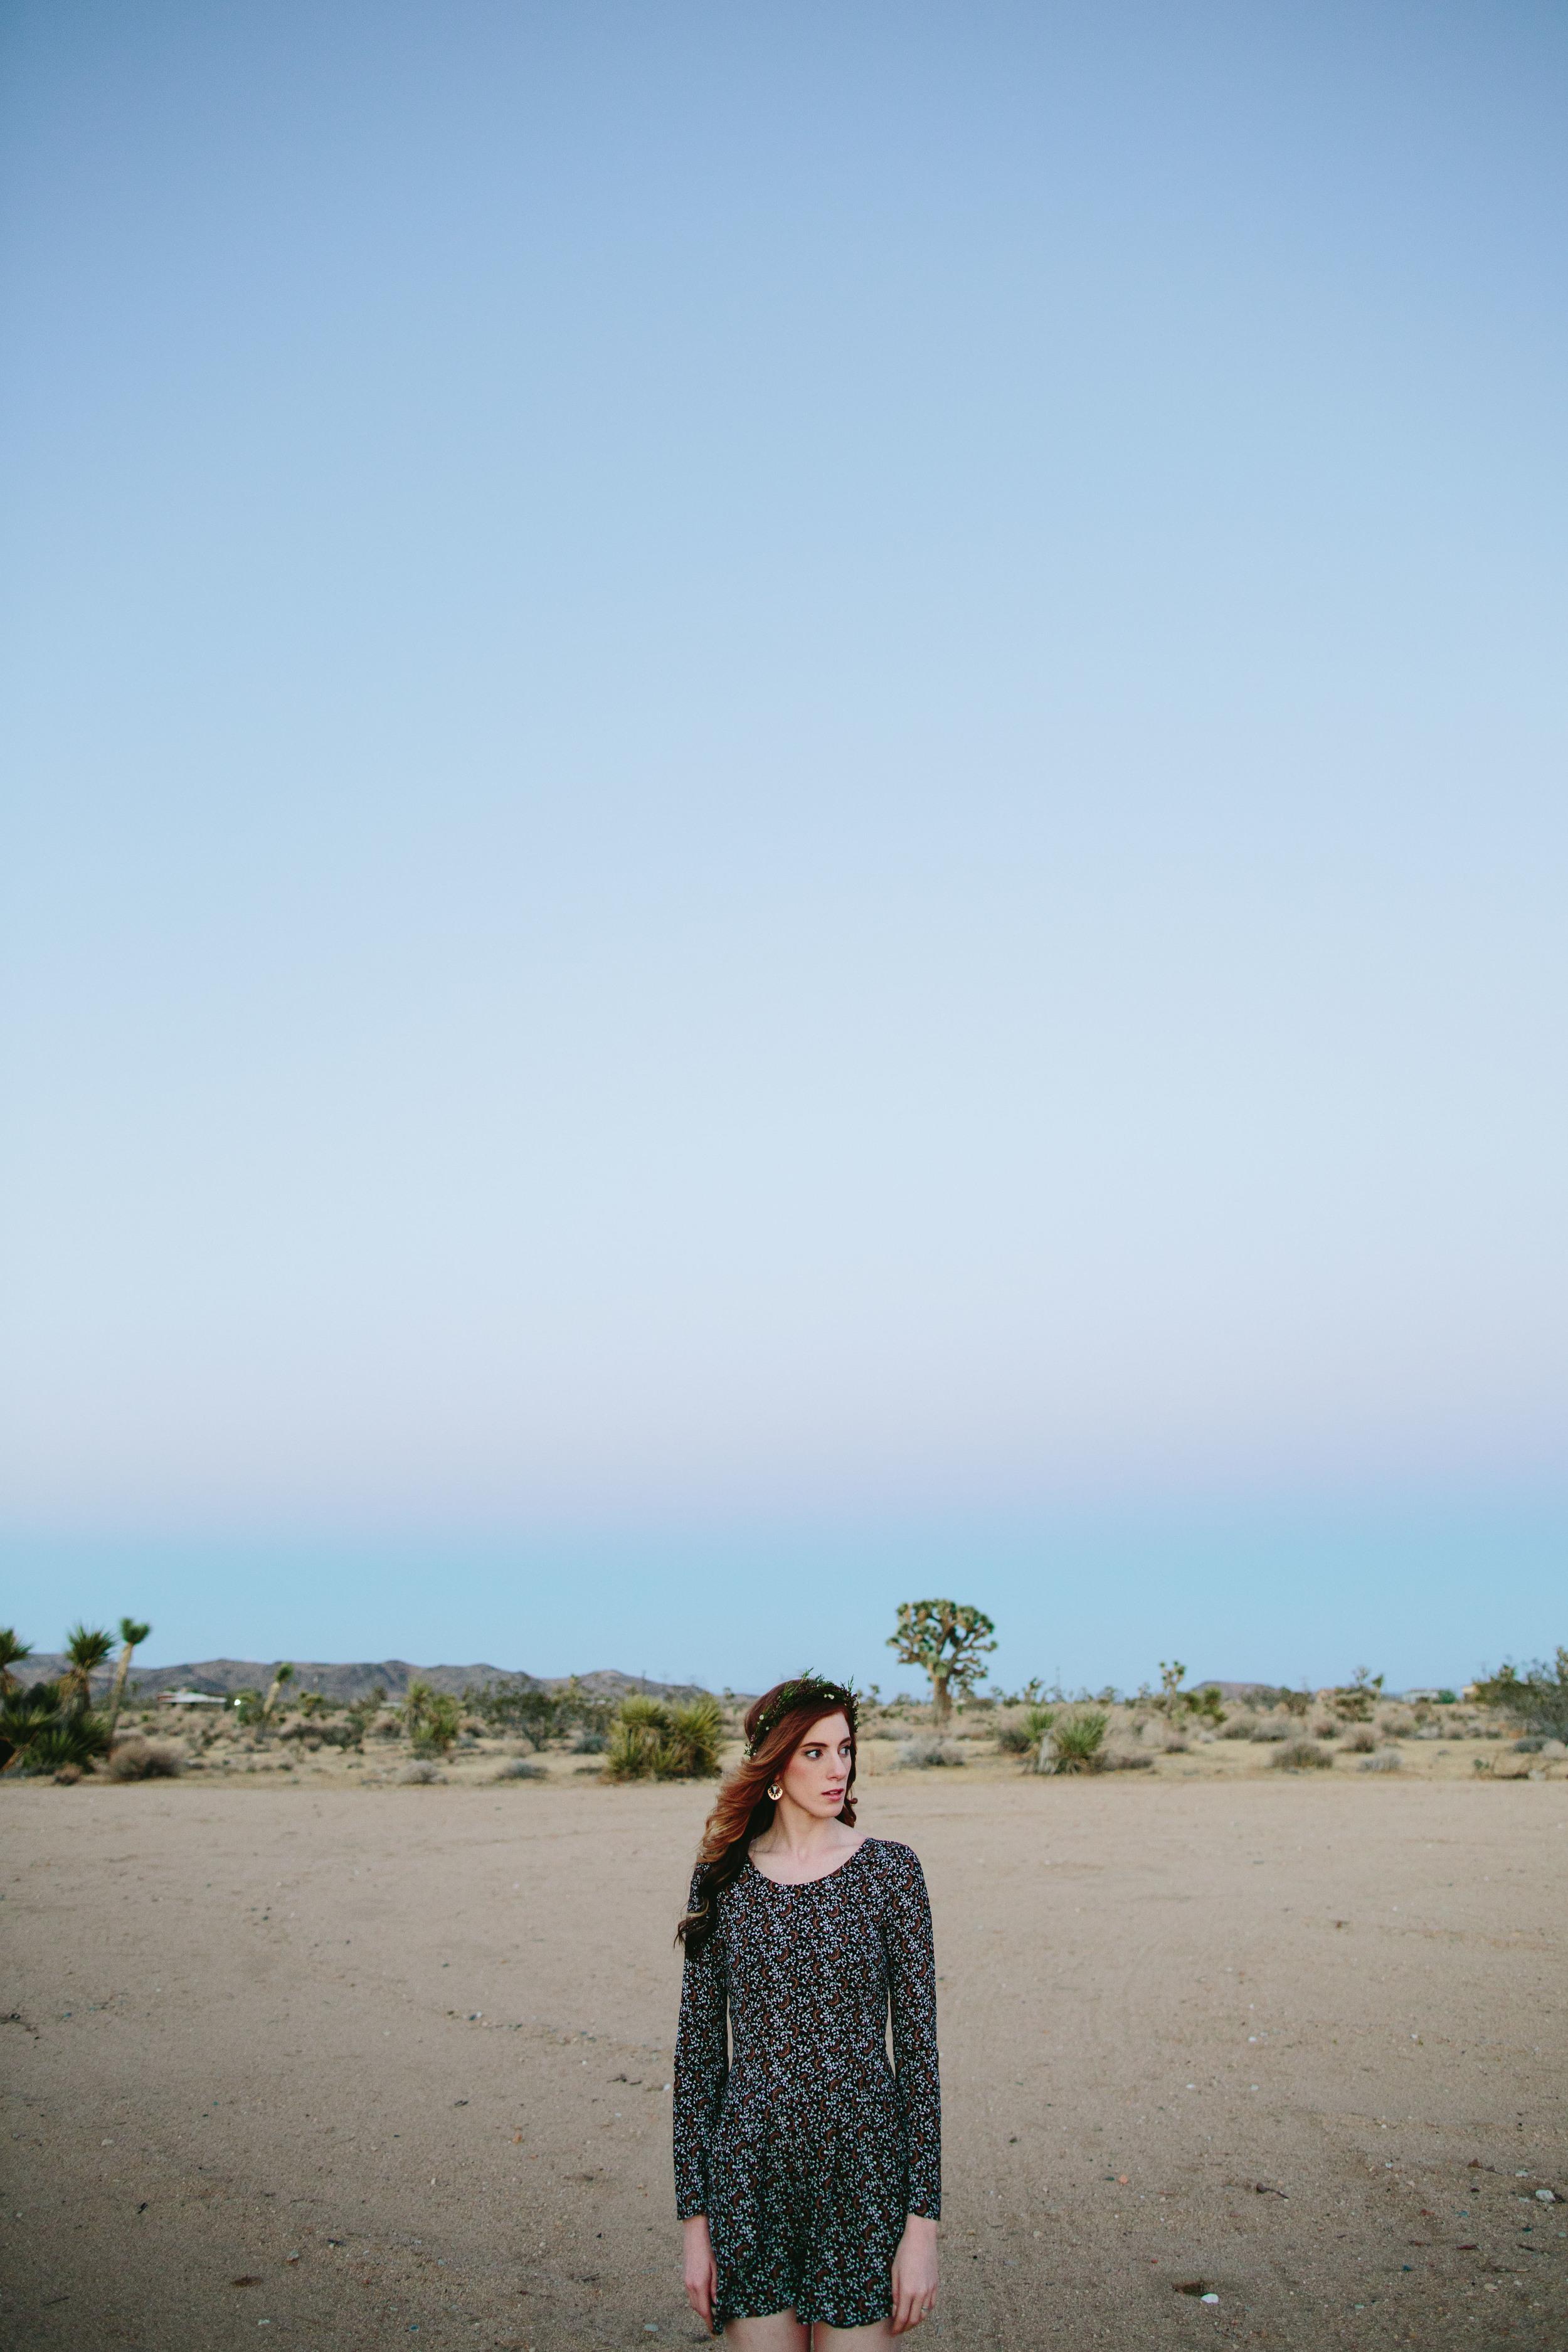 A Desert Gathering // The Eternal Child